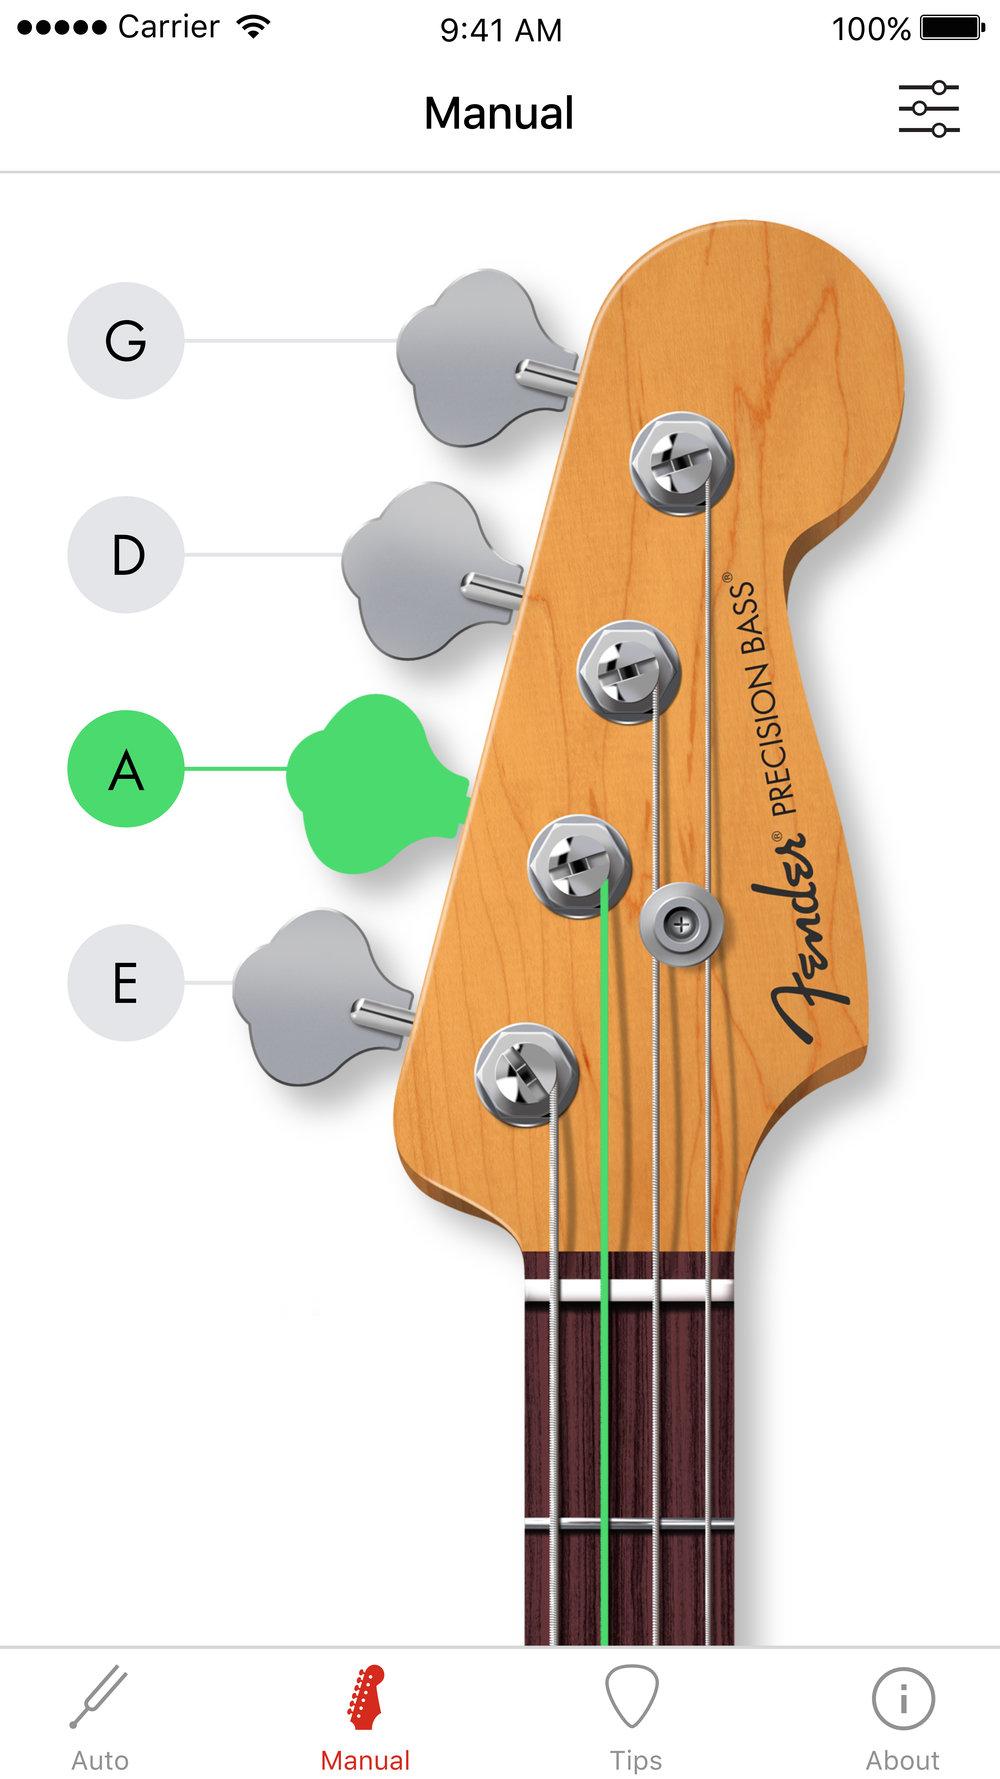 tuner-manual-bass.jpg